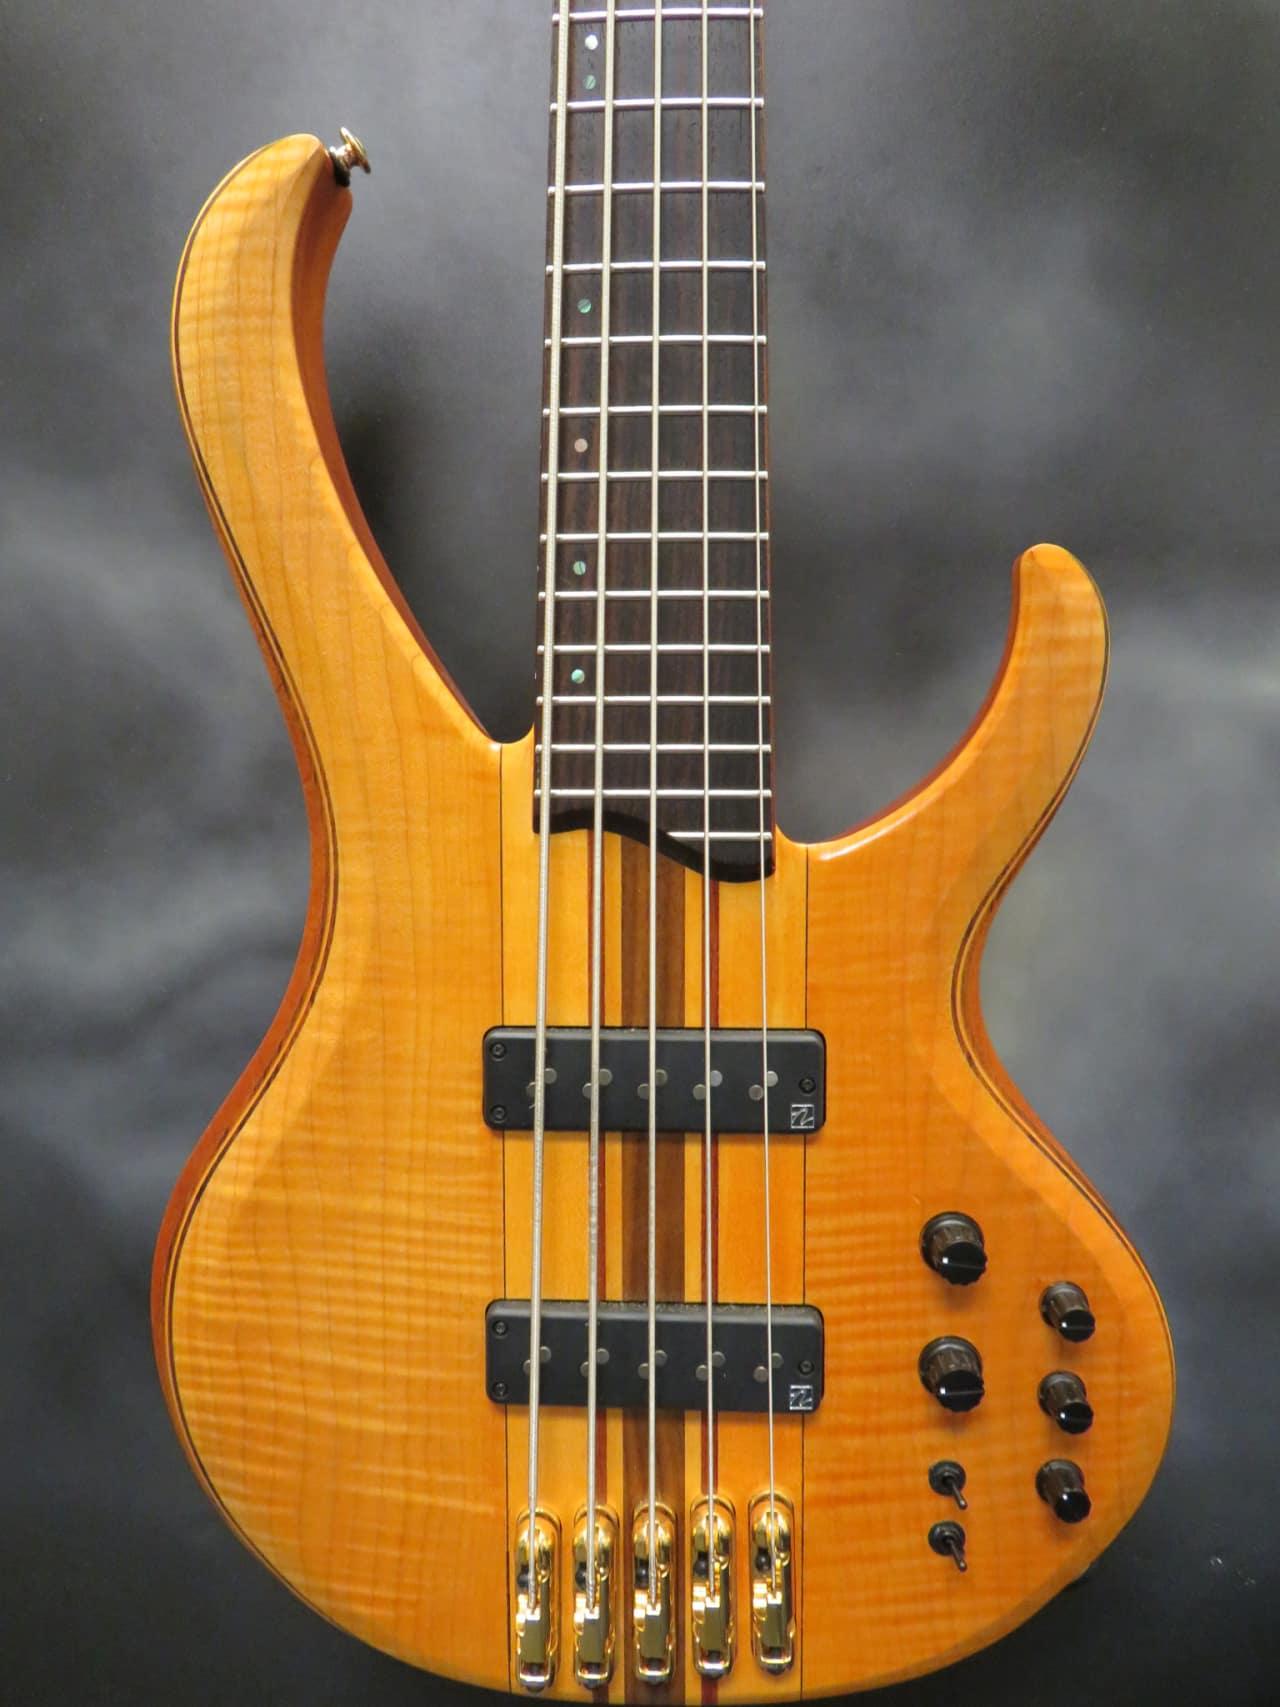 ibanez btb1405e premium 5 string electric bass natural reverb. Black Bedroom Furniture Sets. Home Design Ideas